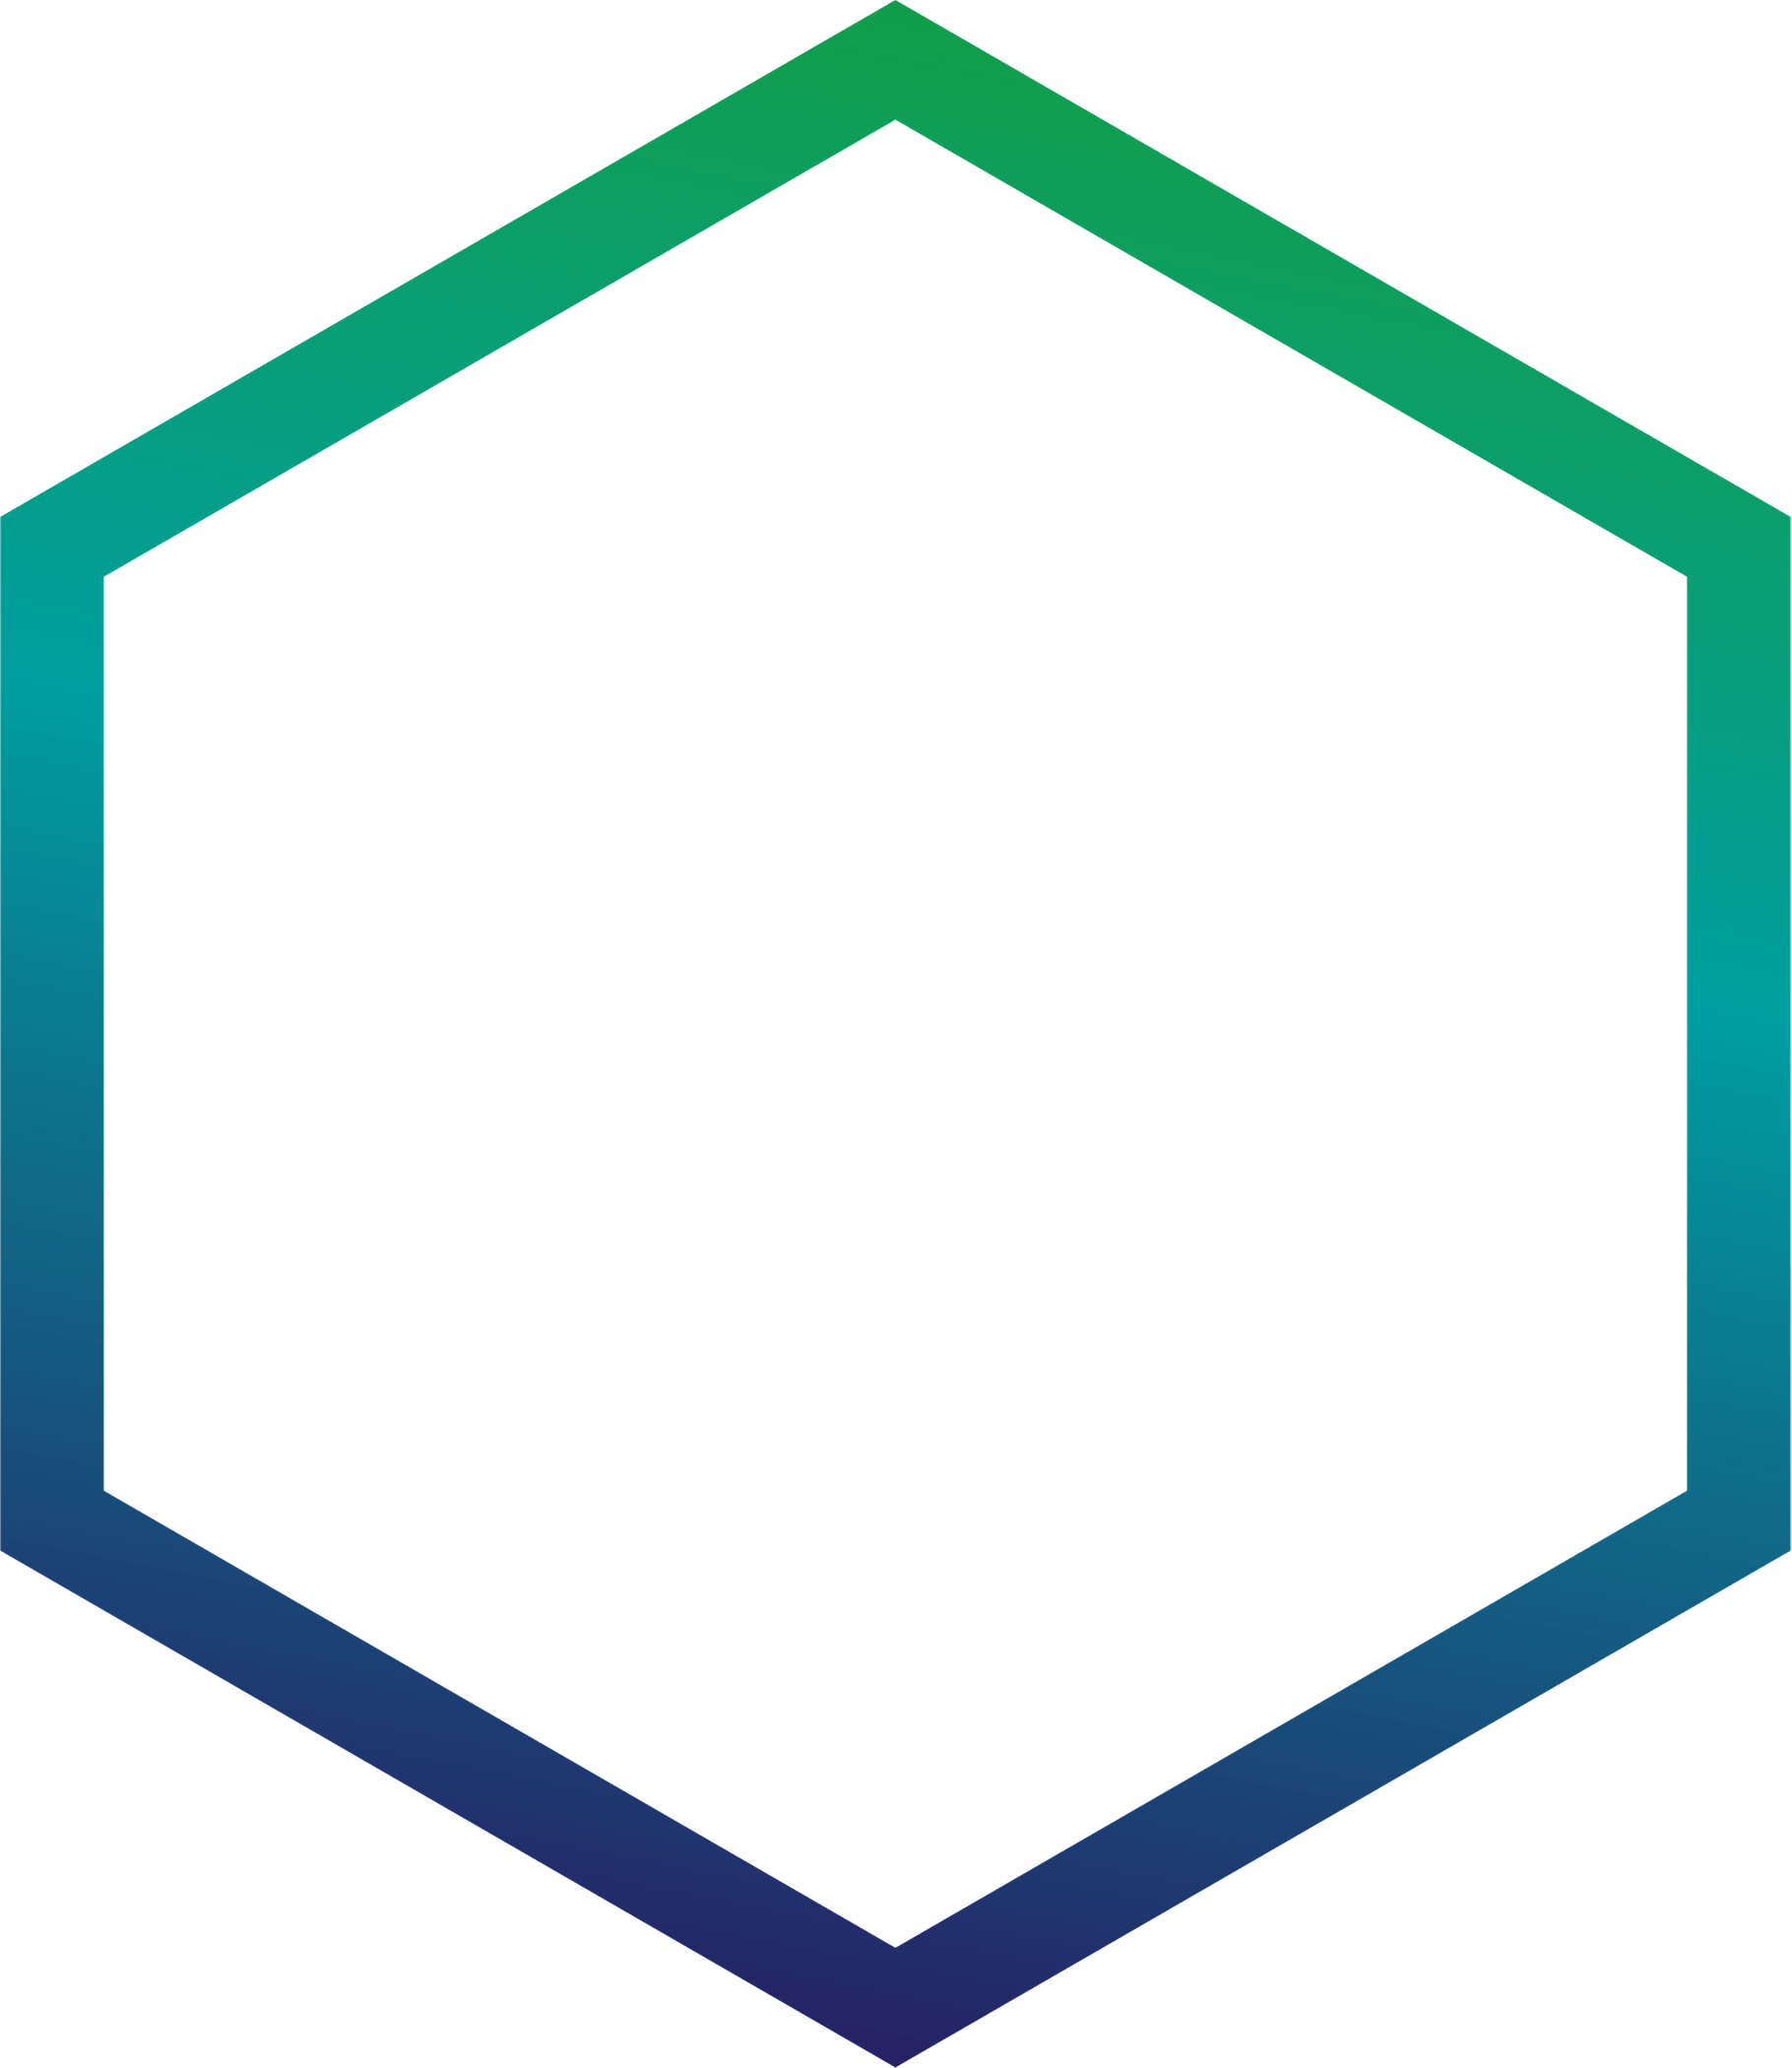 VSL - _Hexagon 2.png